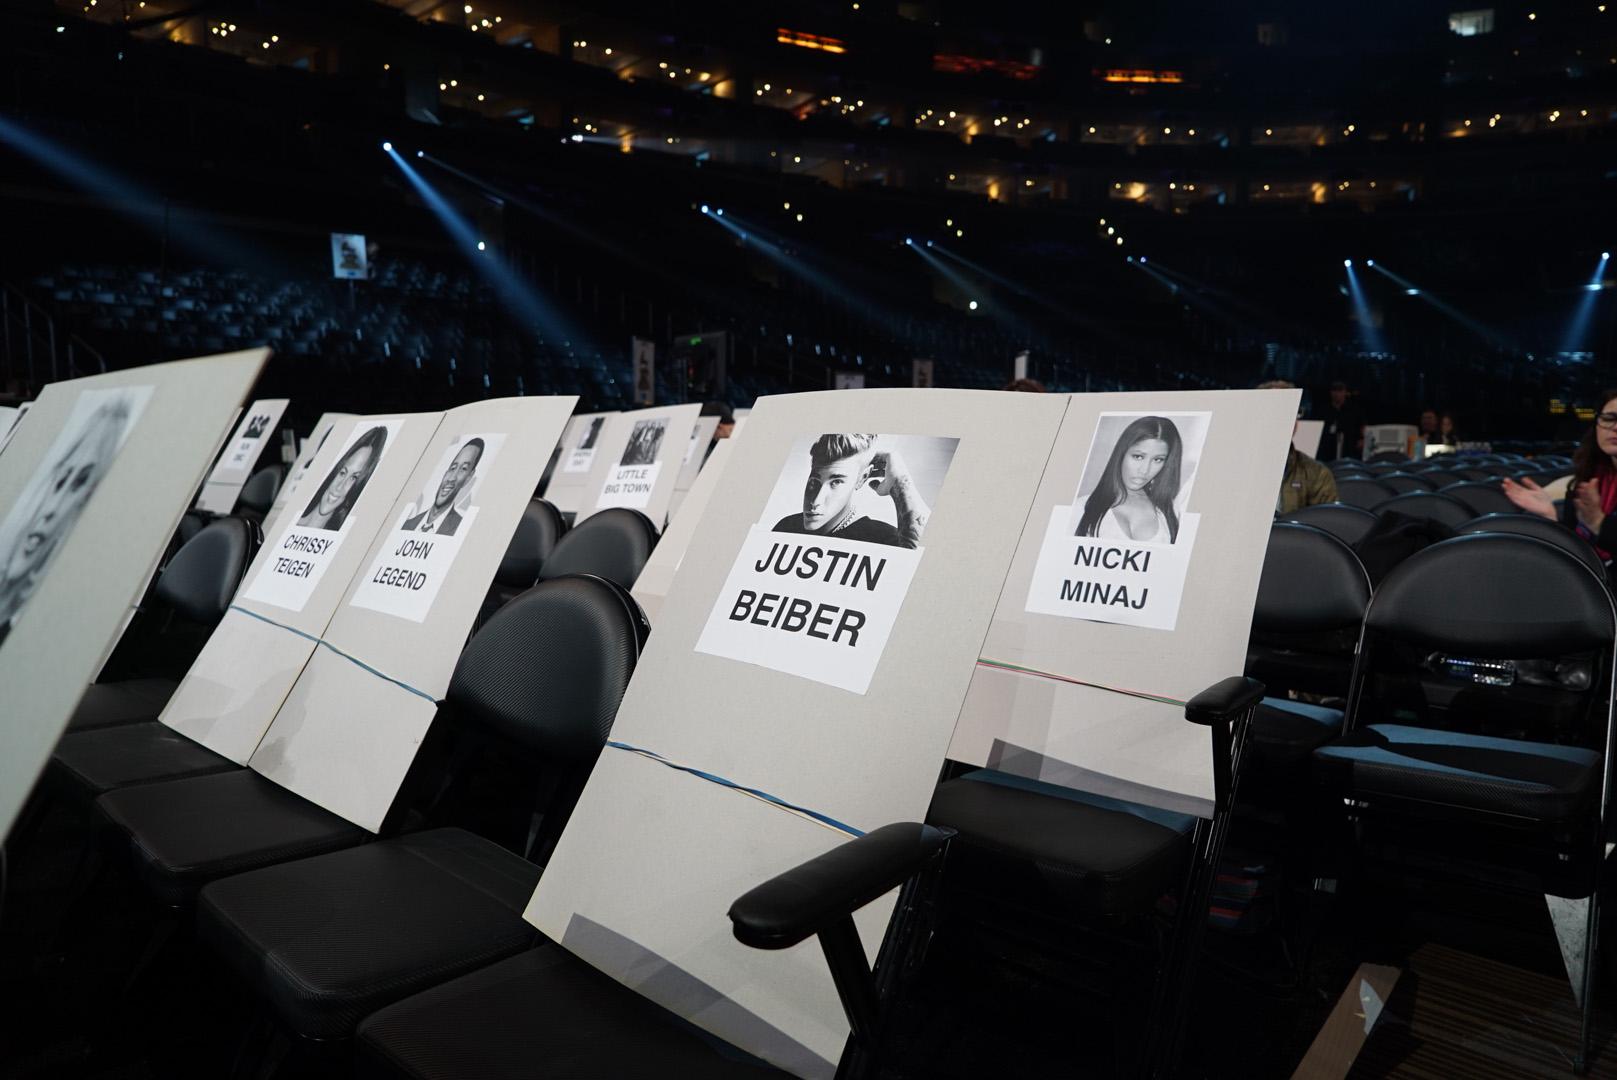 Justin Bieber and Nicki Minaj will be sharing breathing space at Music's Biggest Night.